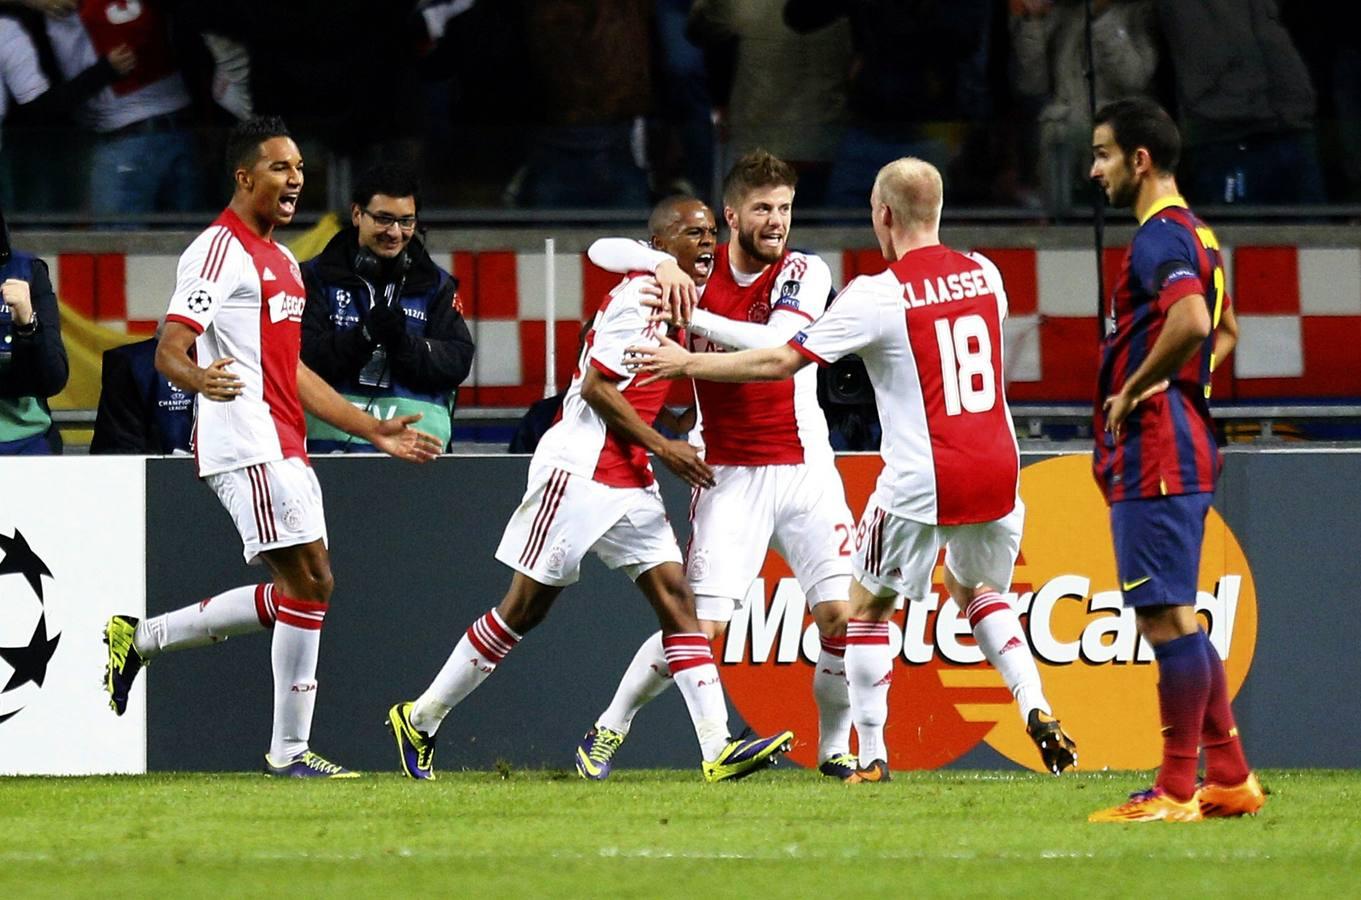 El Barça cae en Ámsterdam